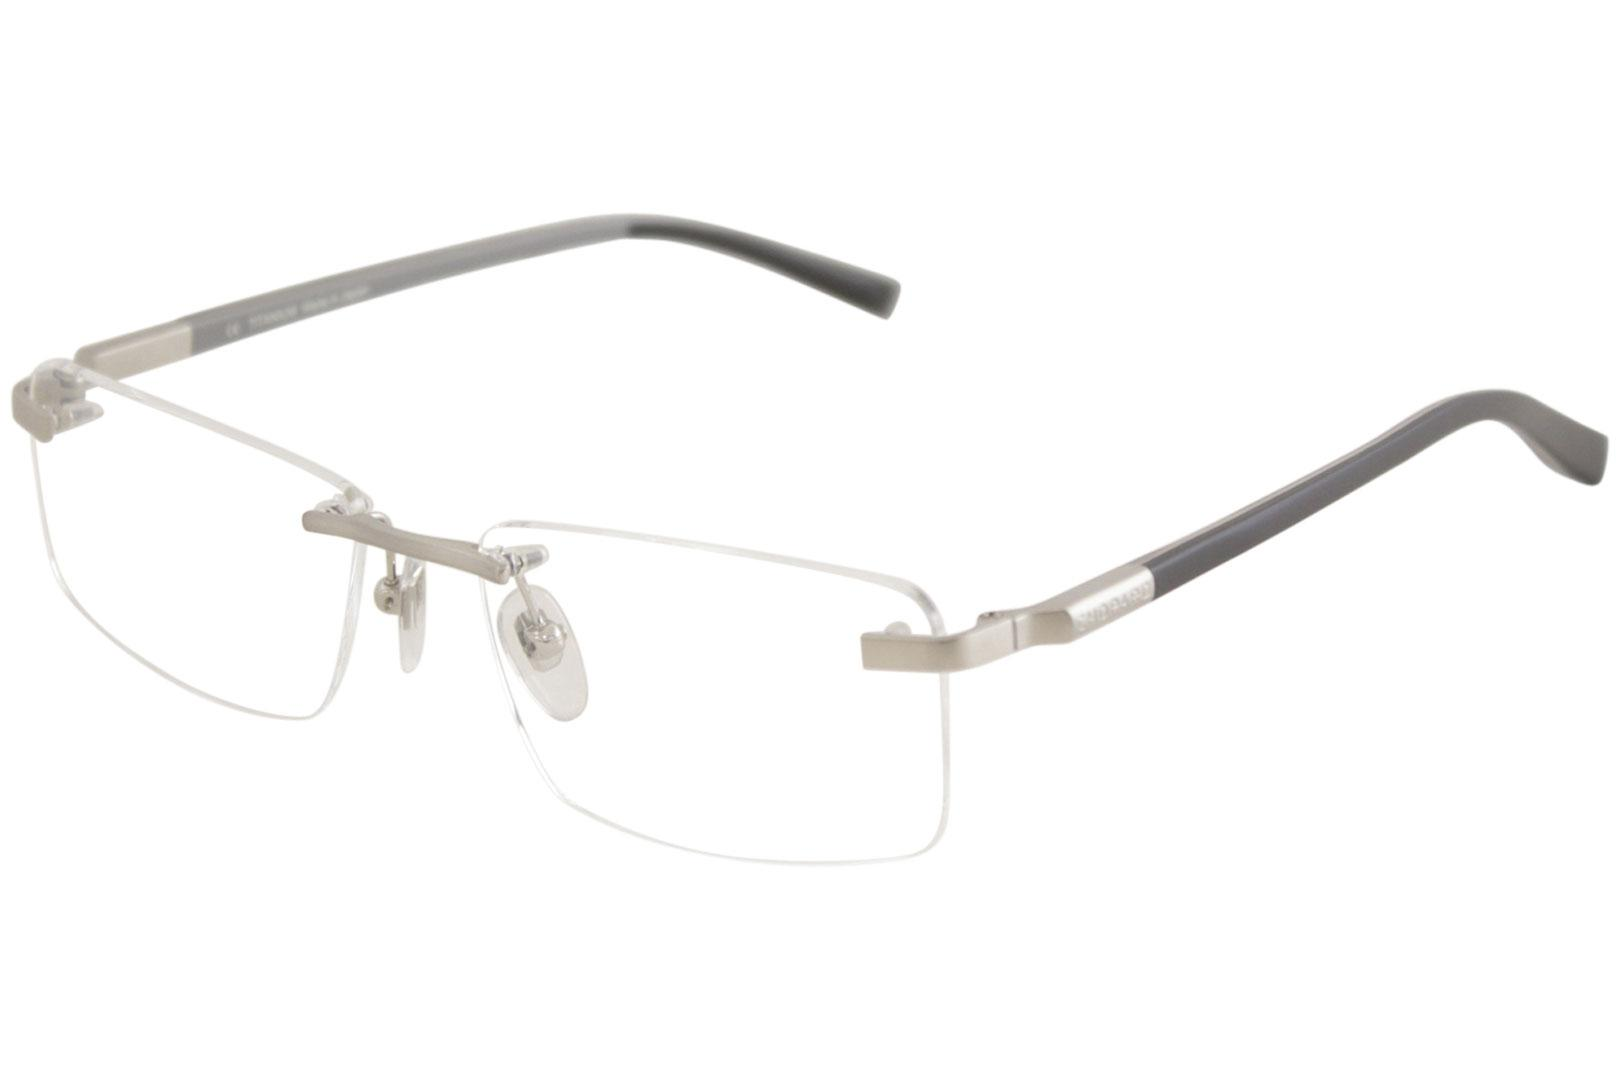 8c4c43cd7f Chopard Women s Eyeglasses VCHA08 VCHA 08 Rimless Optical Frame